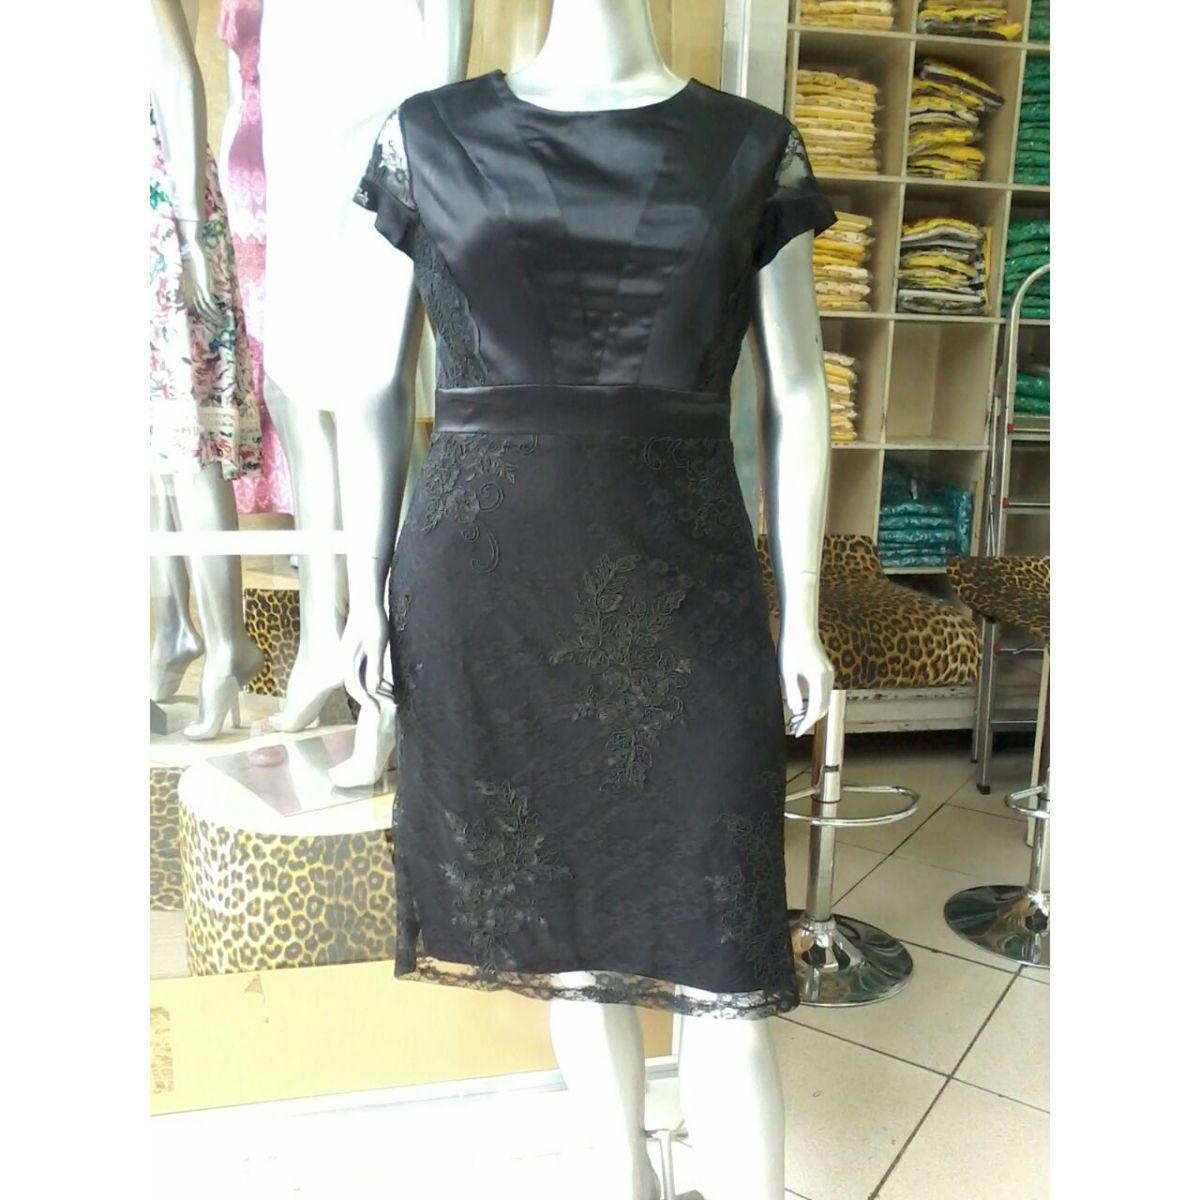 1524-Vestido plus size longo em renda c/ forro det. em cotton cetim